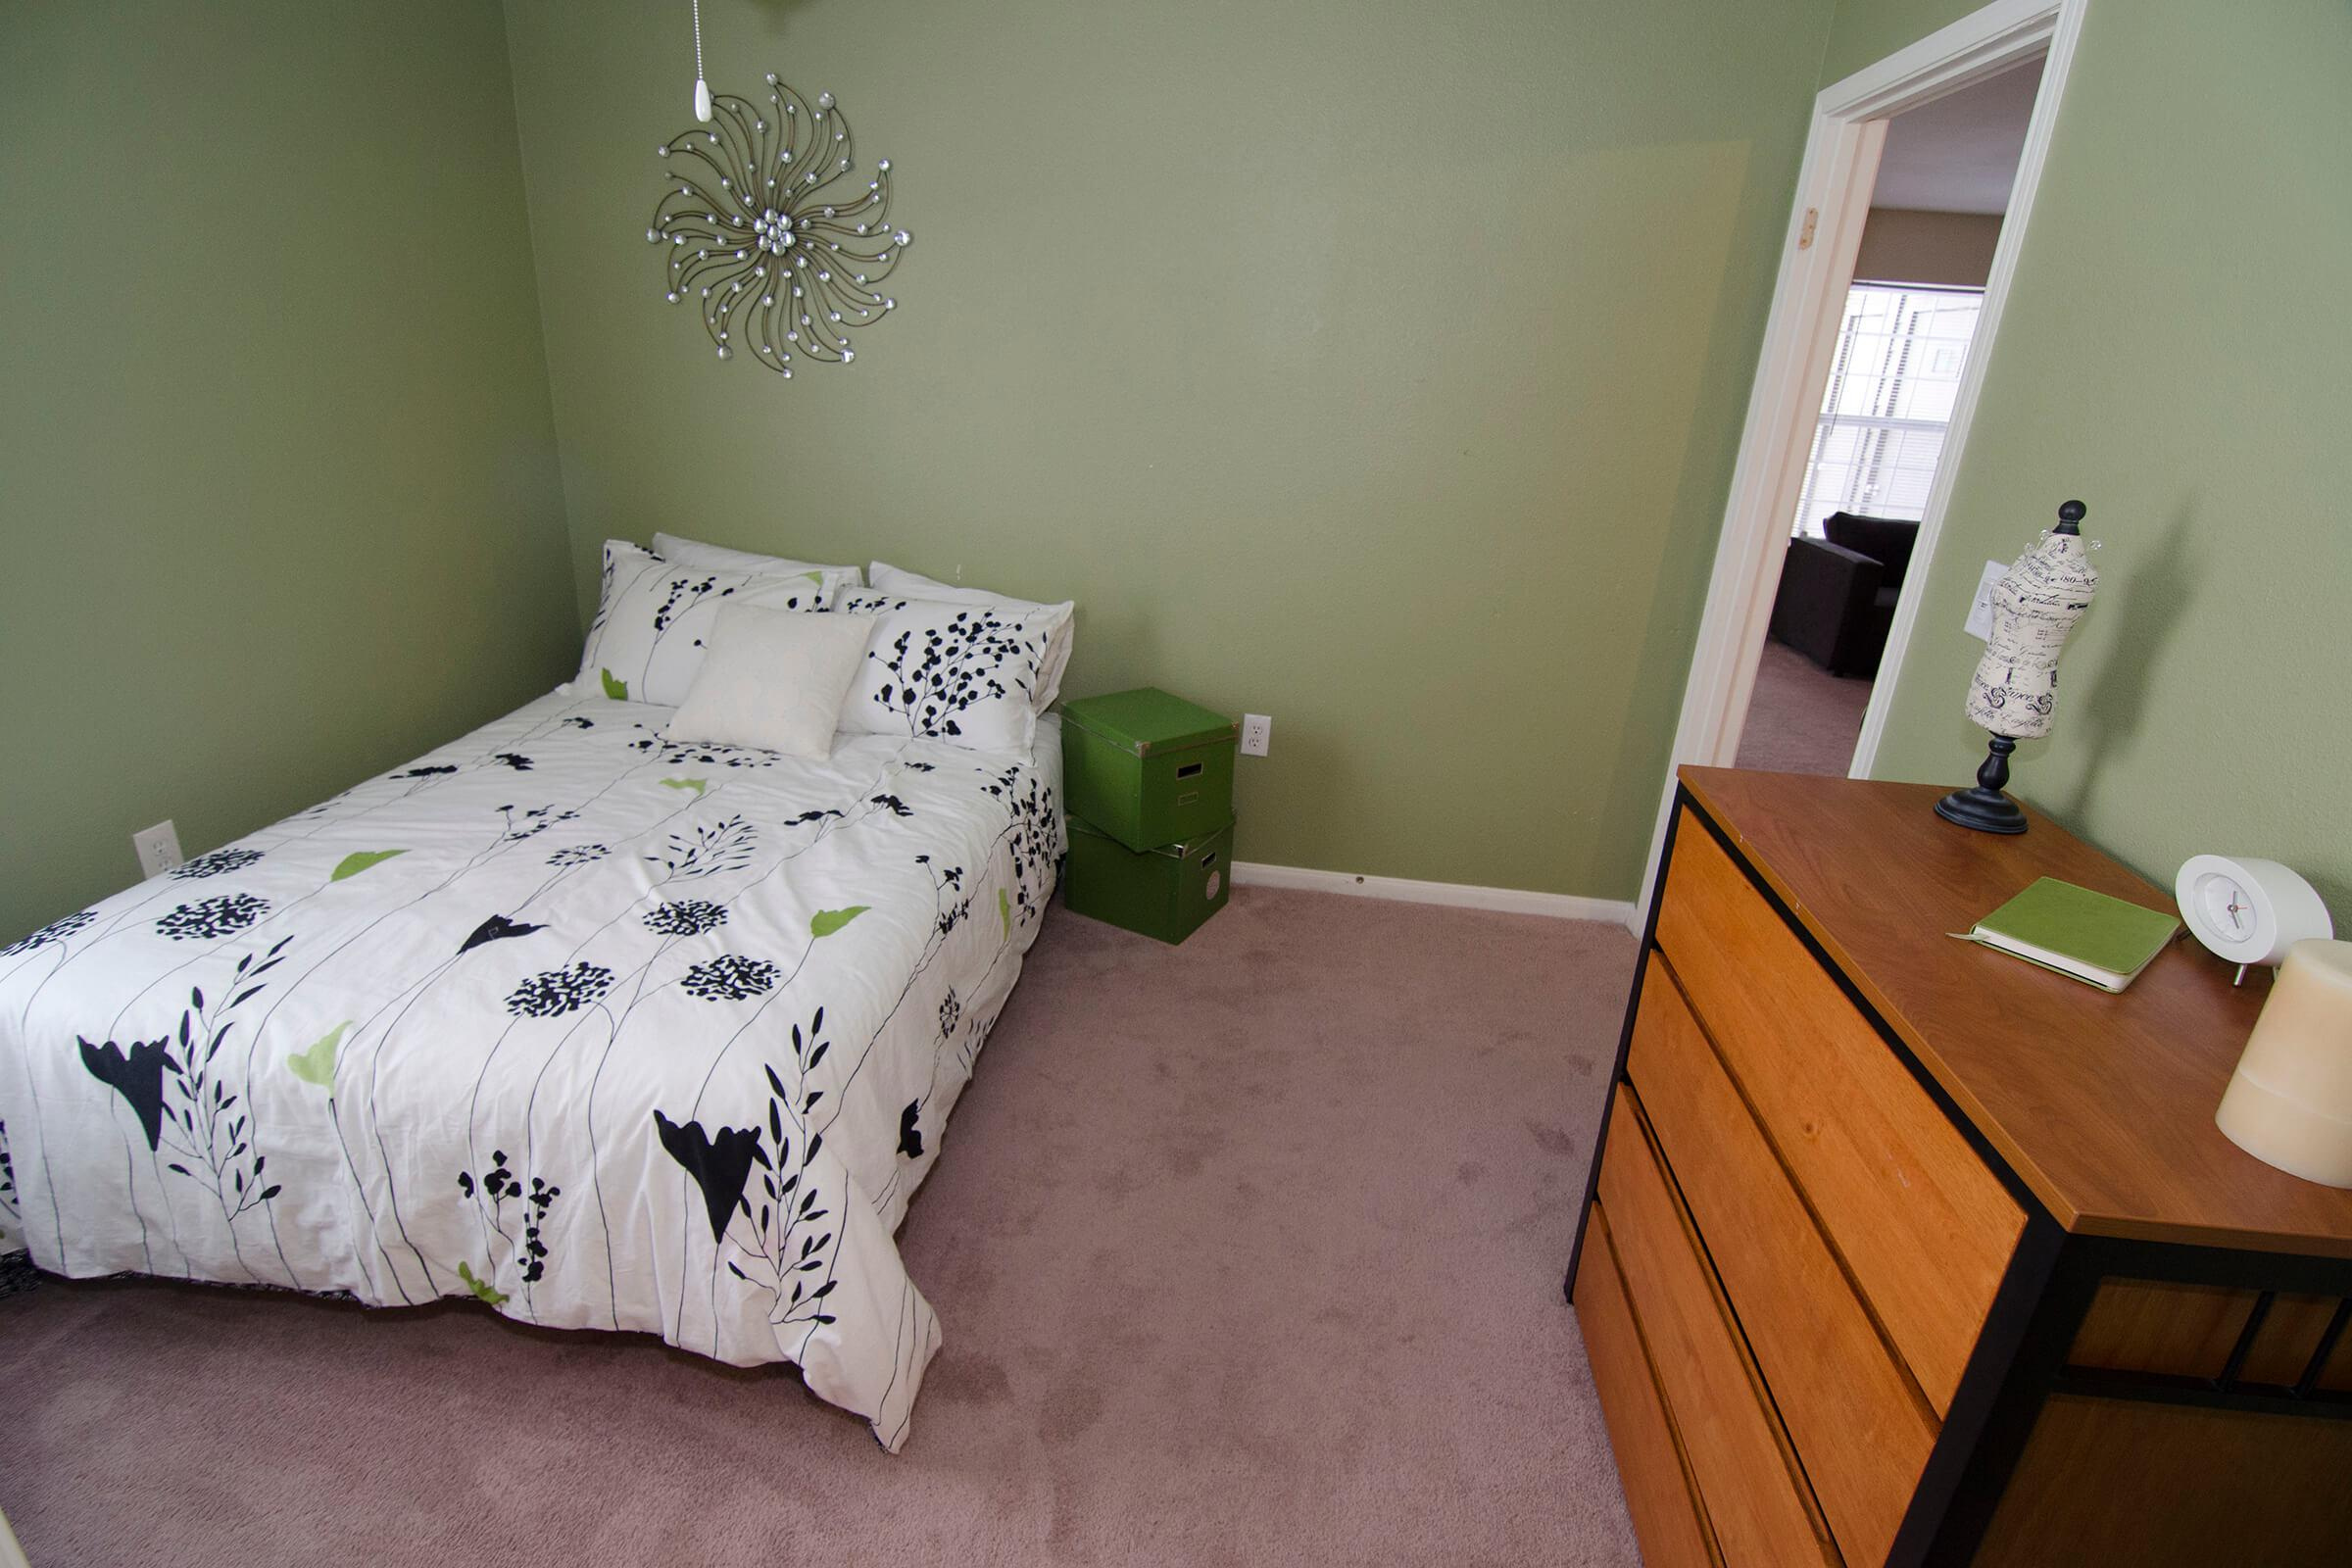 BEAUTIFULLY DESIGNED BEDROOM